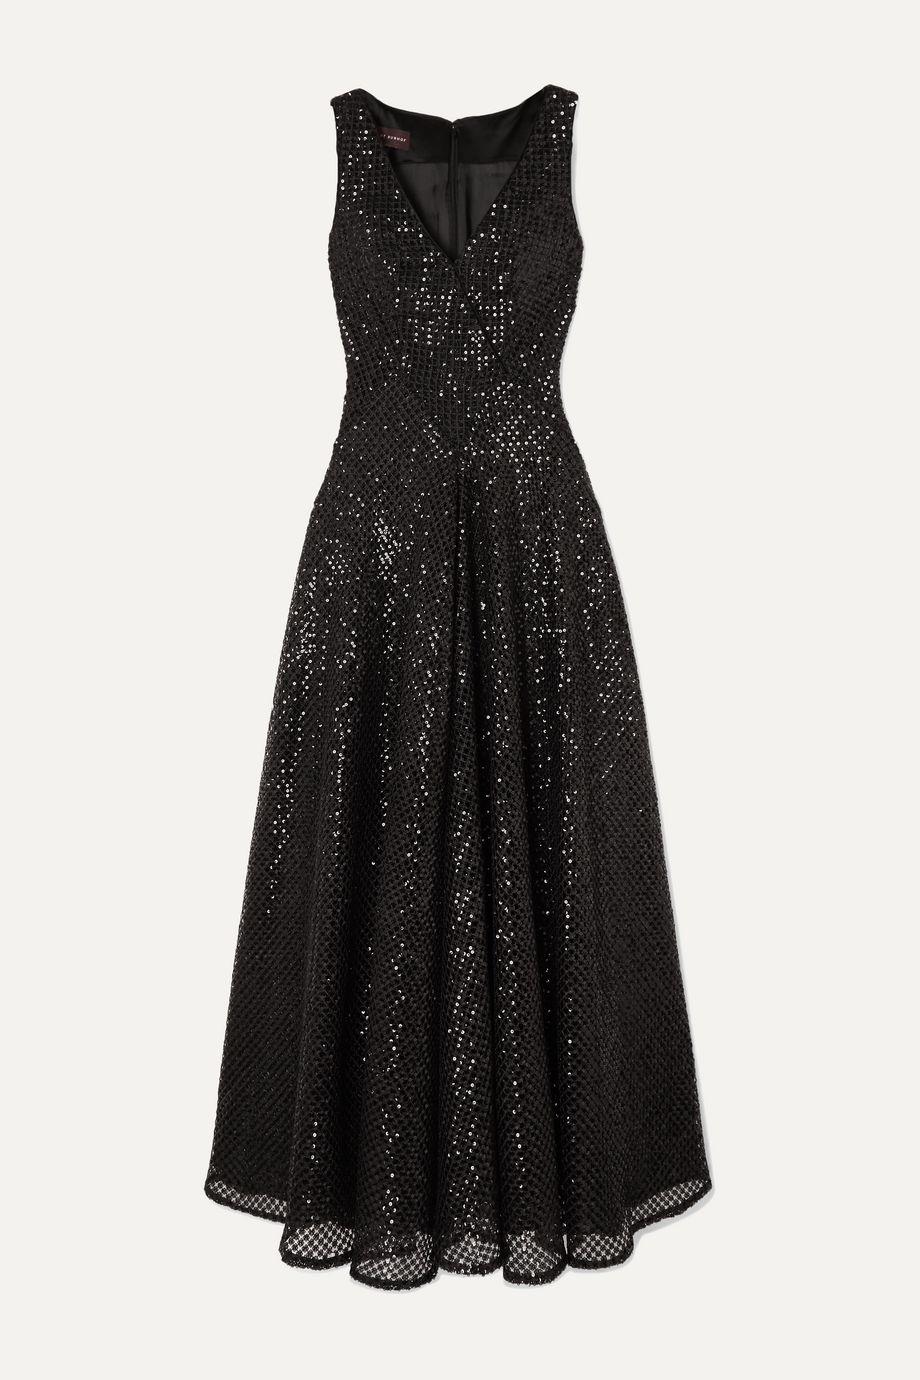 Talbot Runhof Tottori sequined macramé gown